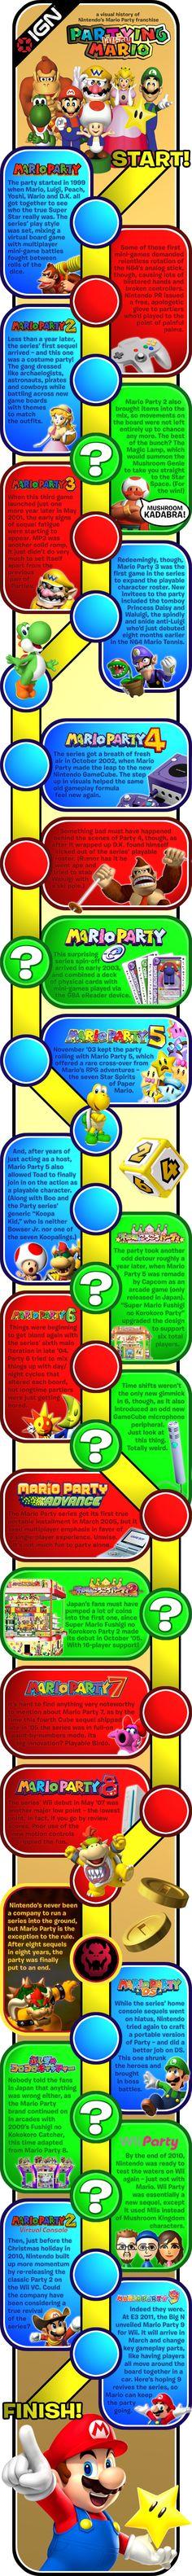 Mario Party History